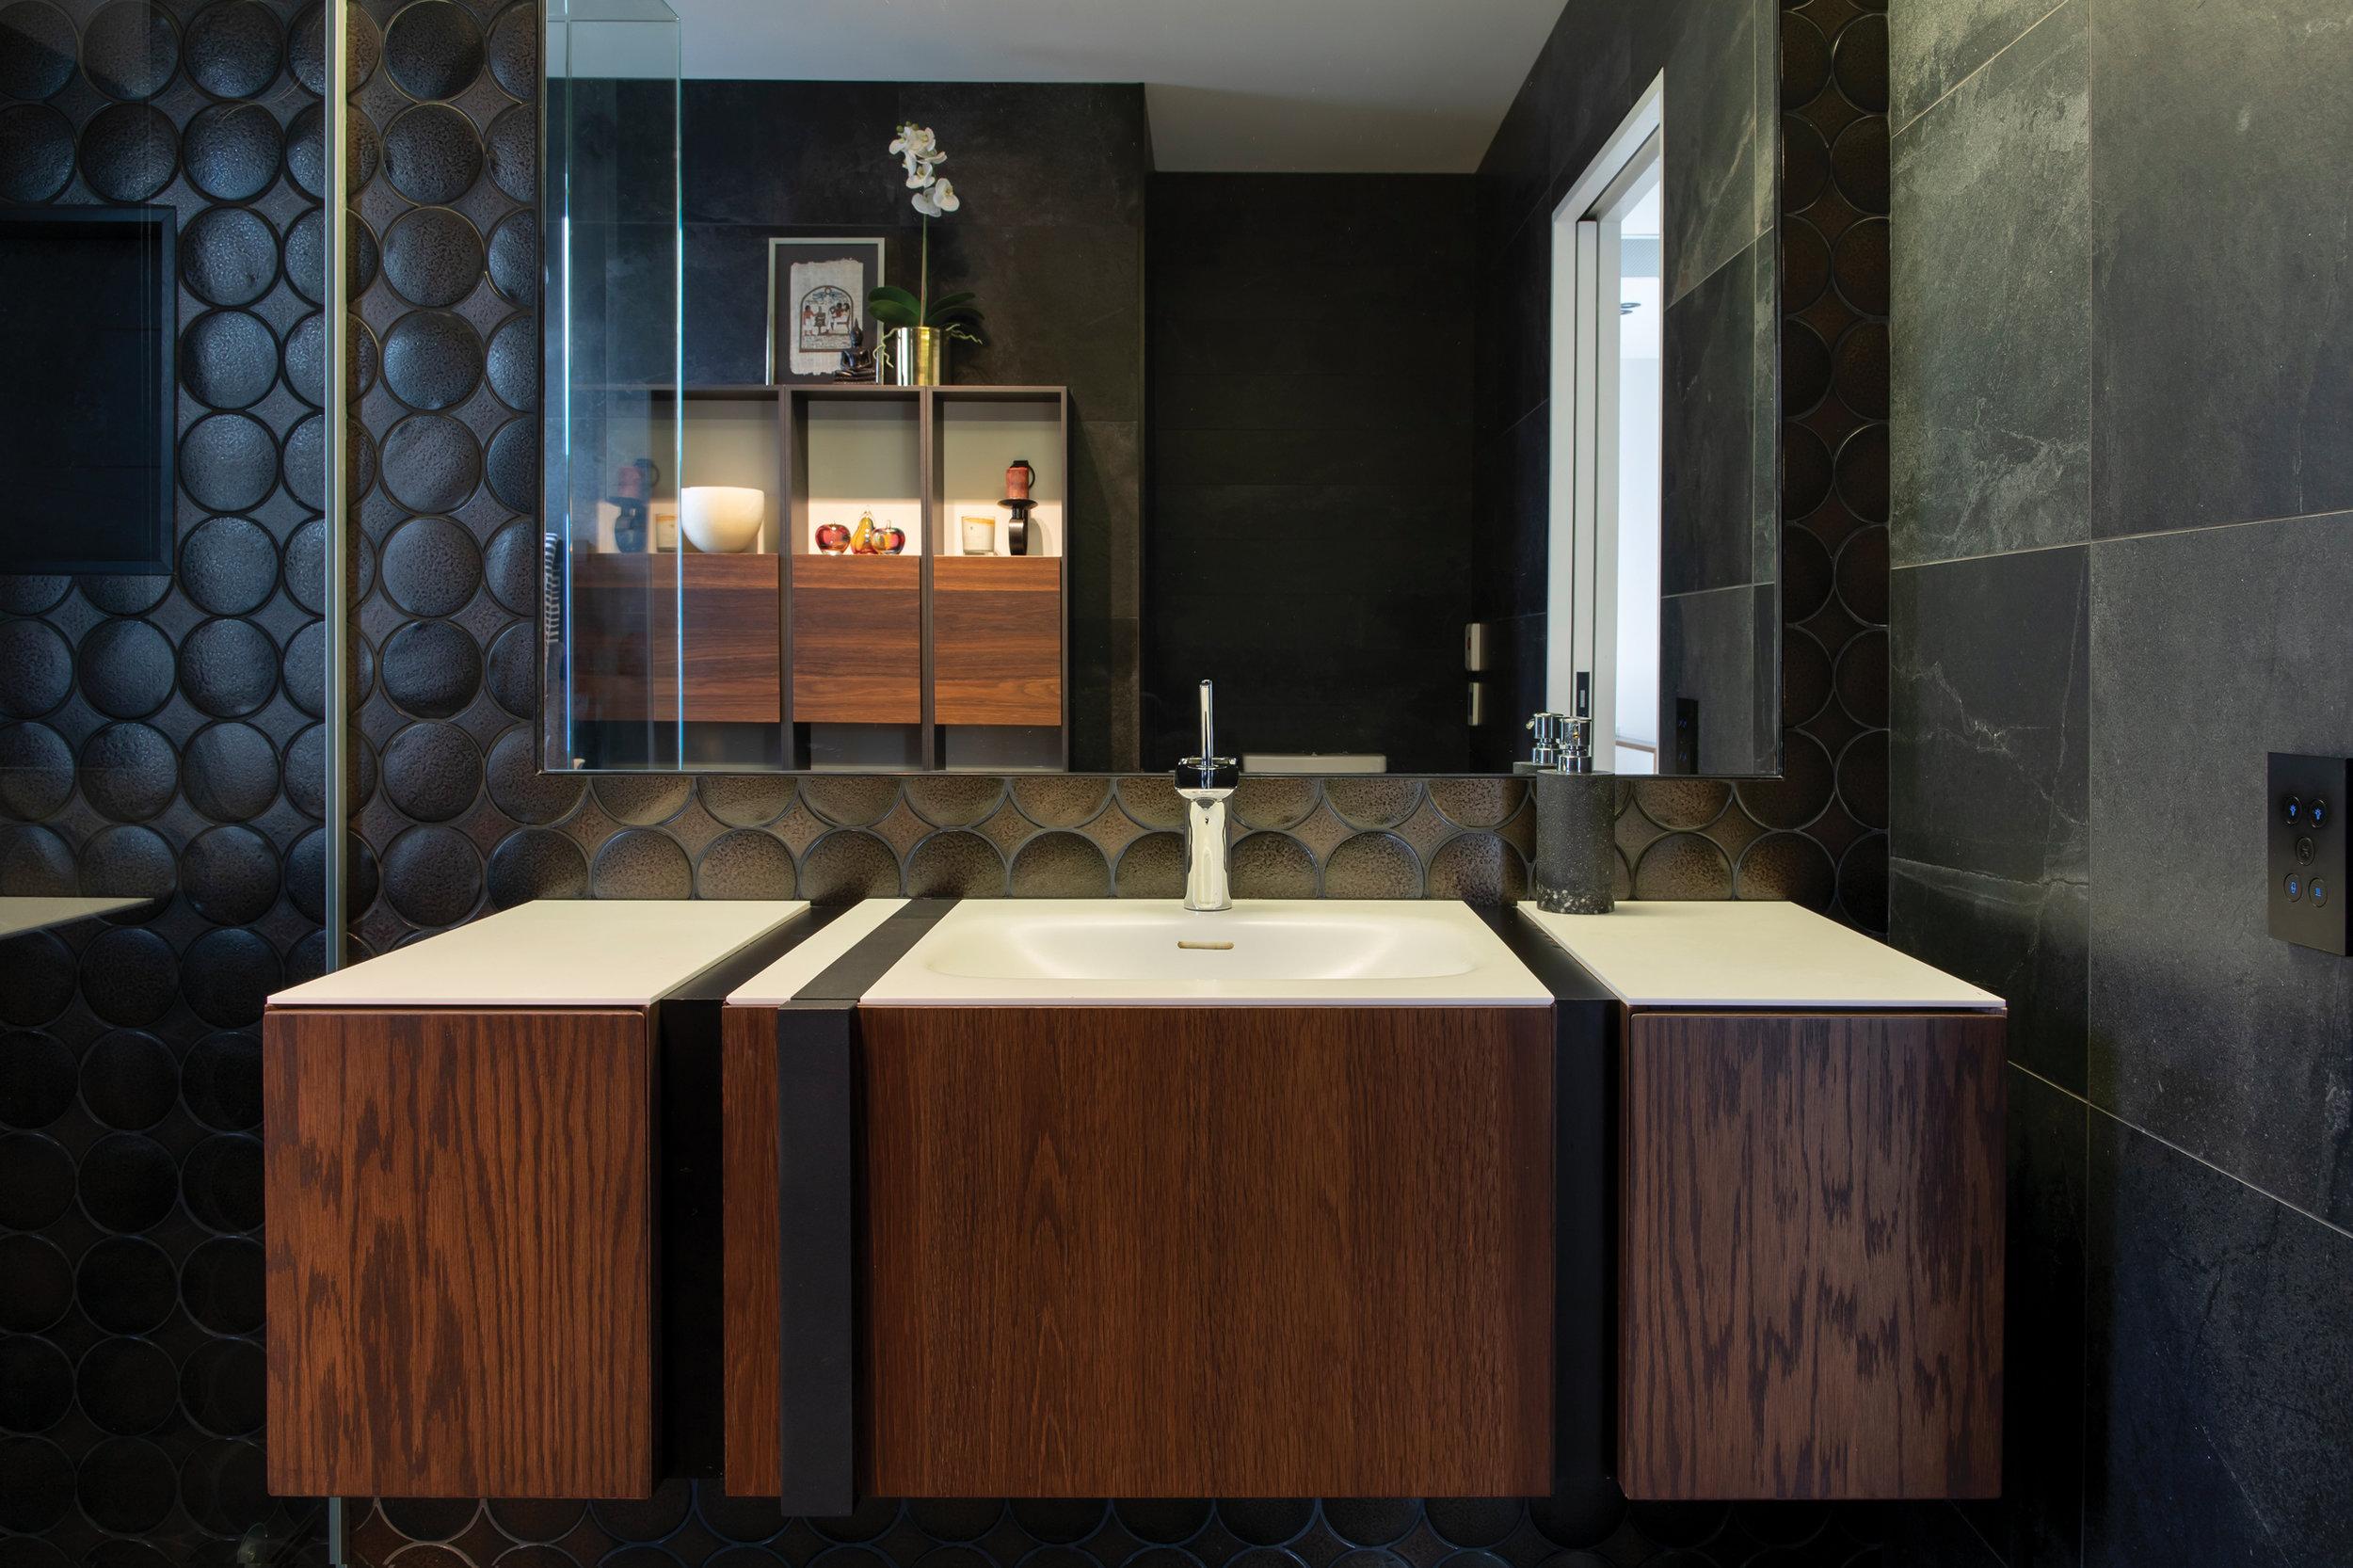 BATHROOM:  Lens Jewel 205 x 400 sheets create a stunning dark bathroom, with Porcelanosa vanity and shelving.